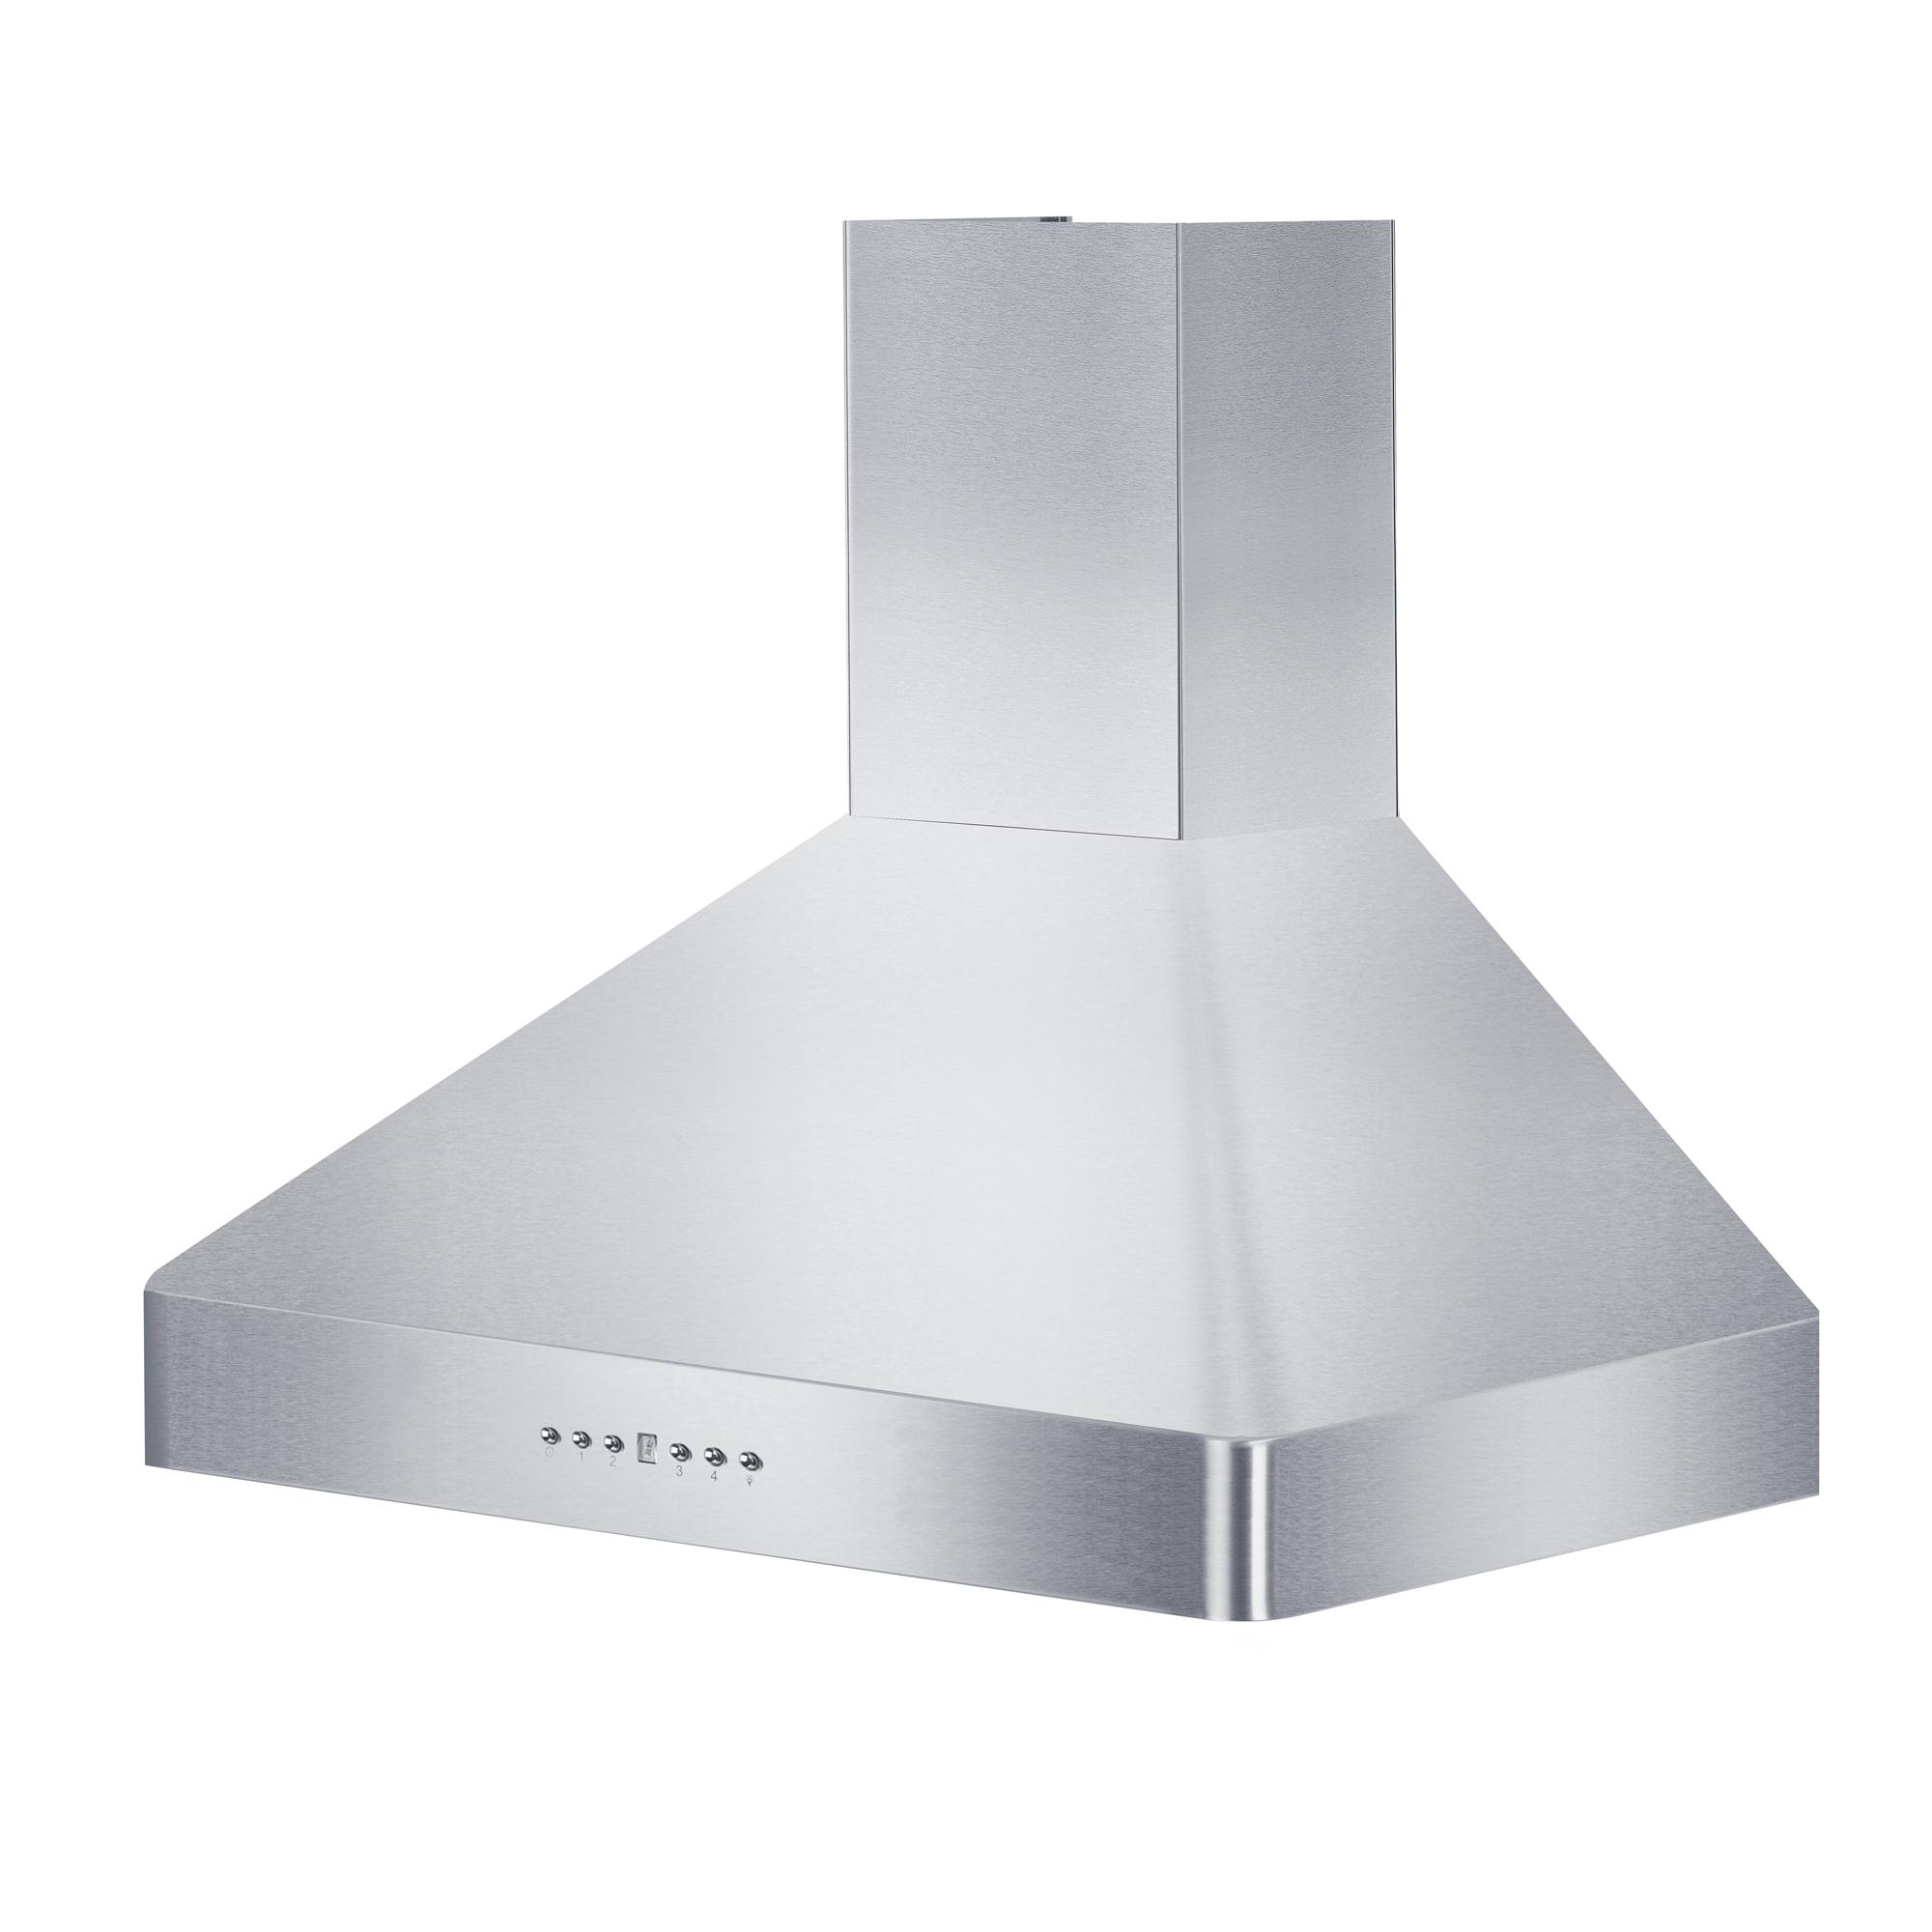 zline-stainless-steel-wall-mounted-range-hood-kf2-new-main.jpg